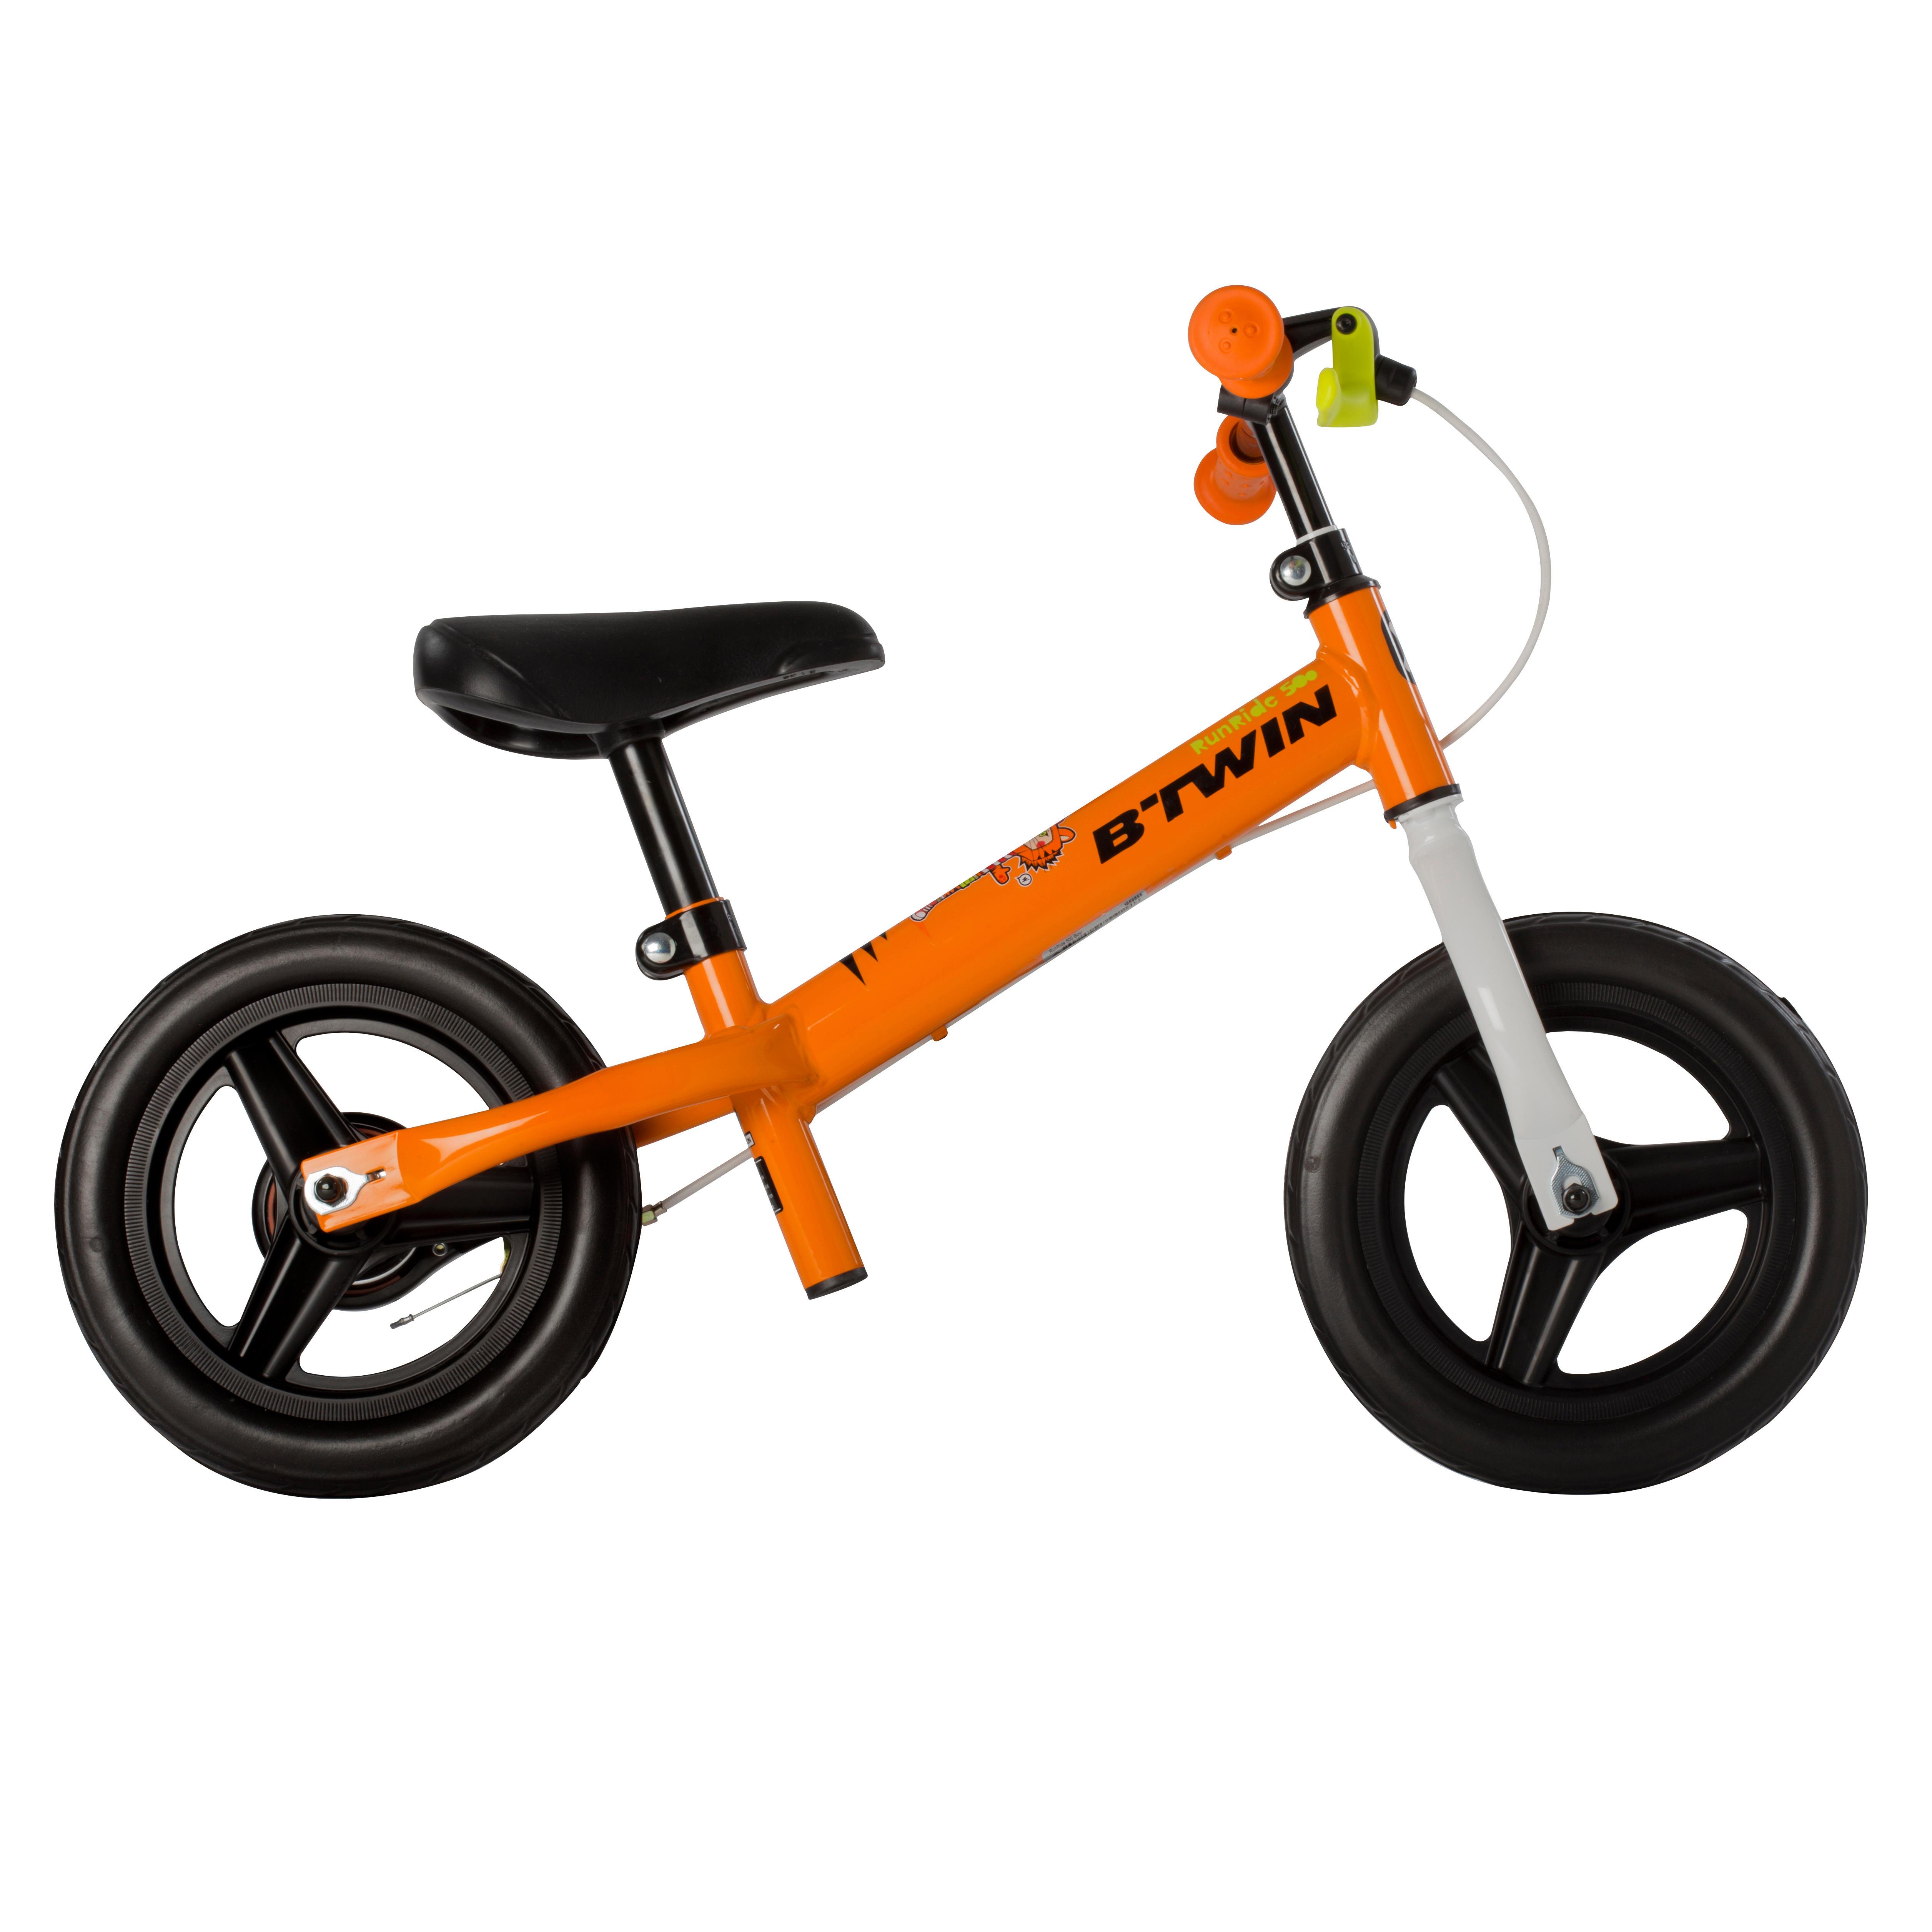 Bicicleta sin pedales para niños de 10 pulgadas Run Ride Naranja